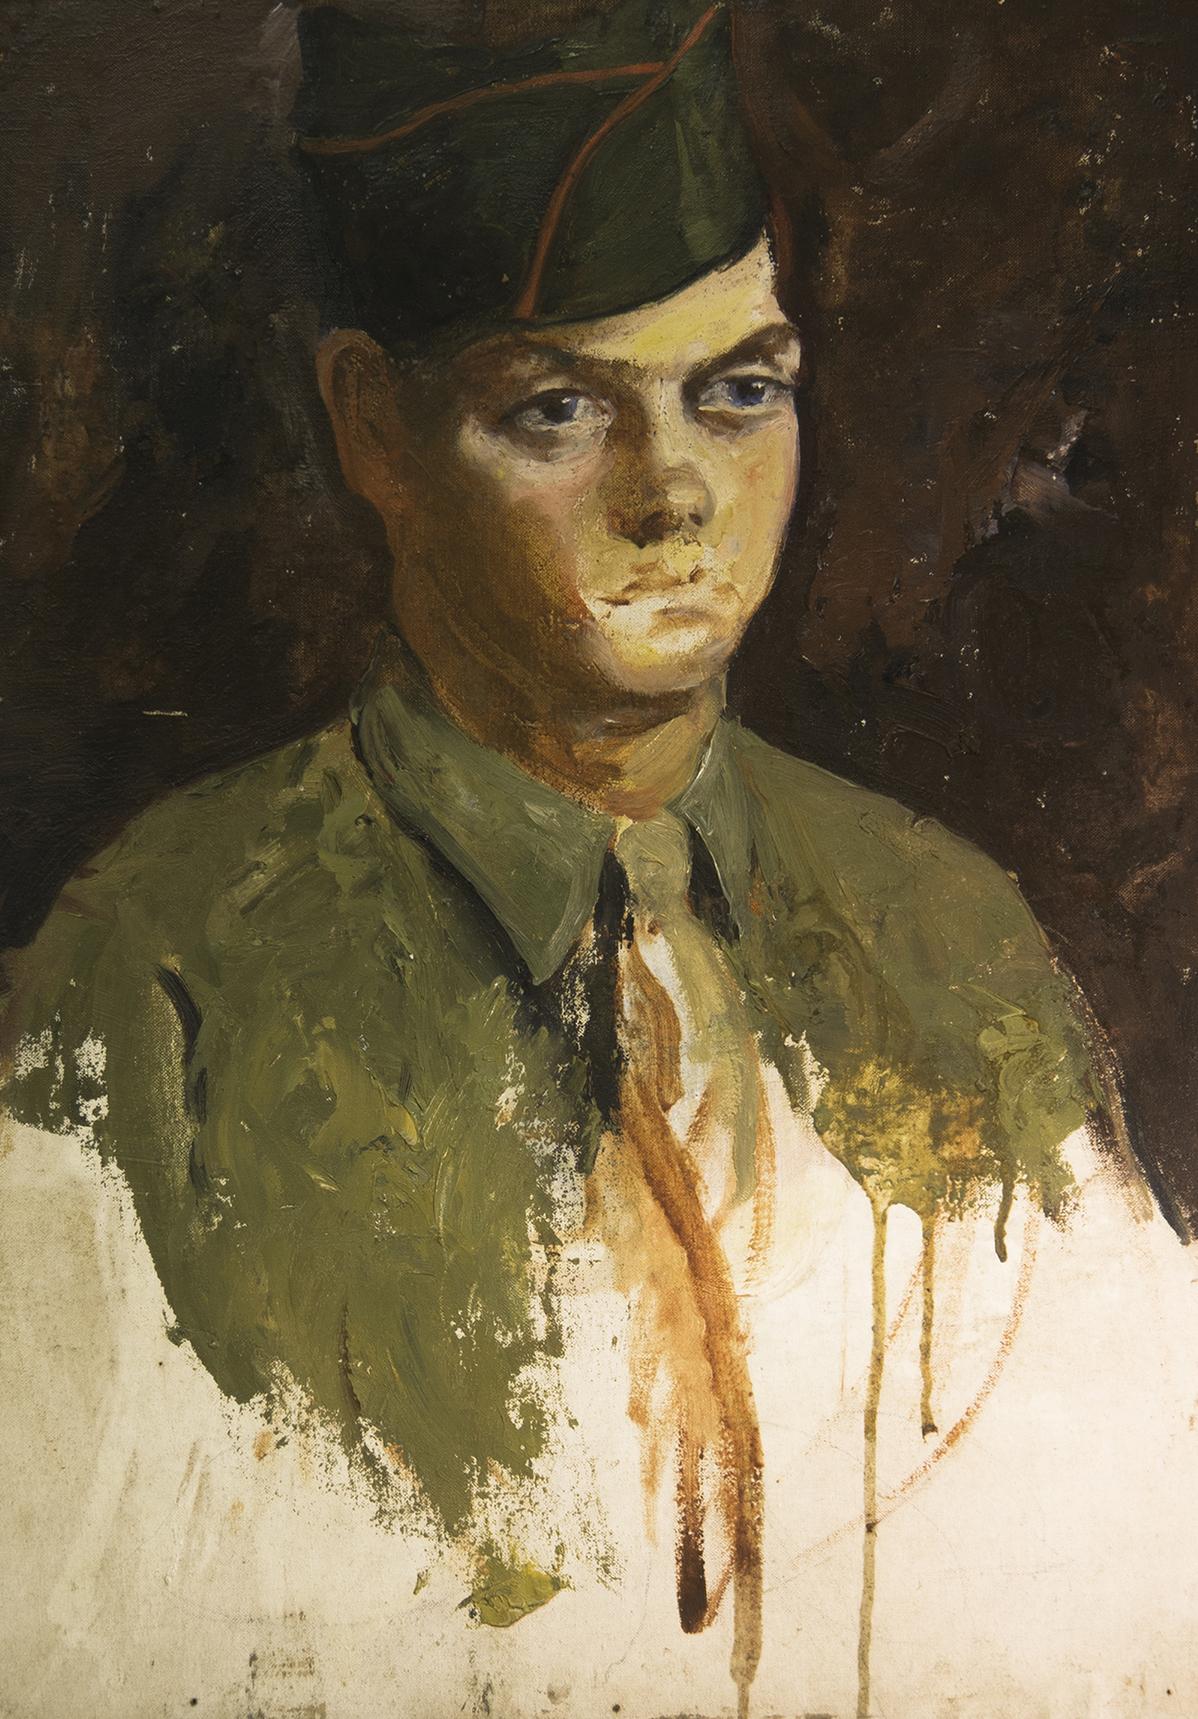 Winfield Kurt Greene aged 20 in 1940